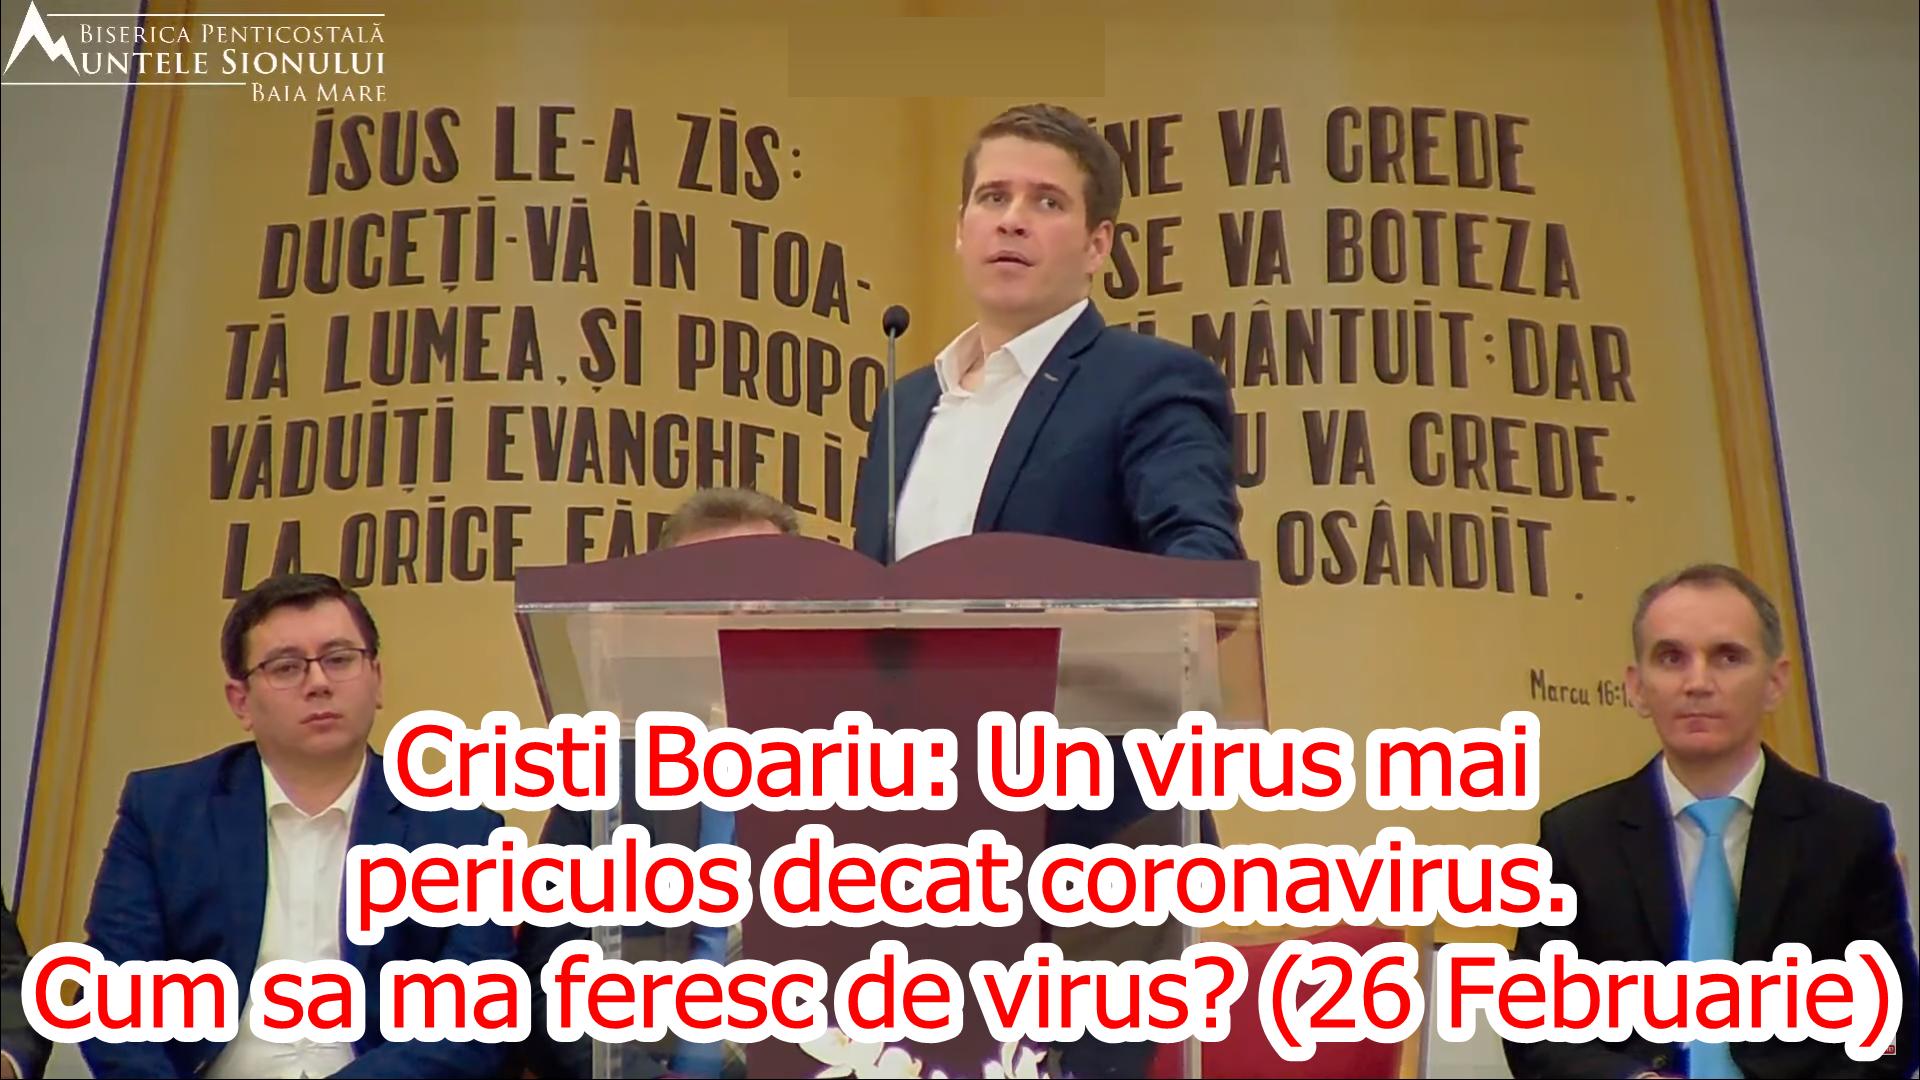 Cristi Boariu: Un virus mai periculos decat coronavirus. Cum sa ma feresc de virus? (26 Februarie)